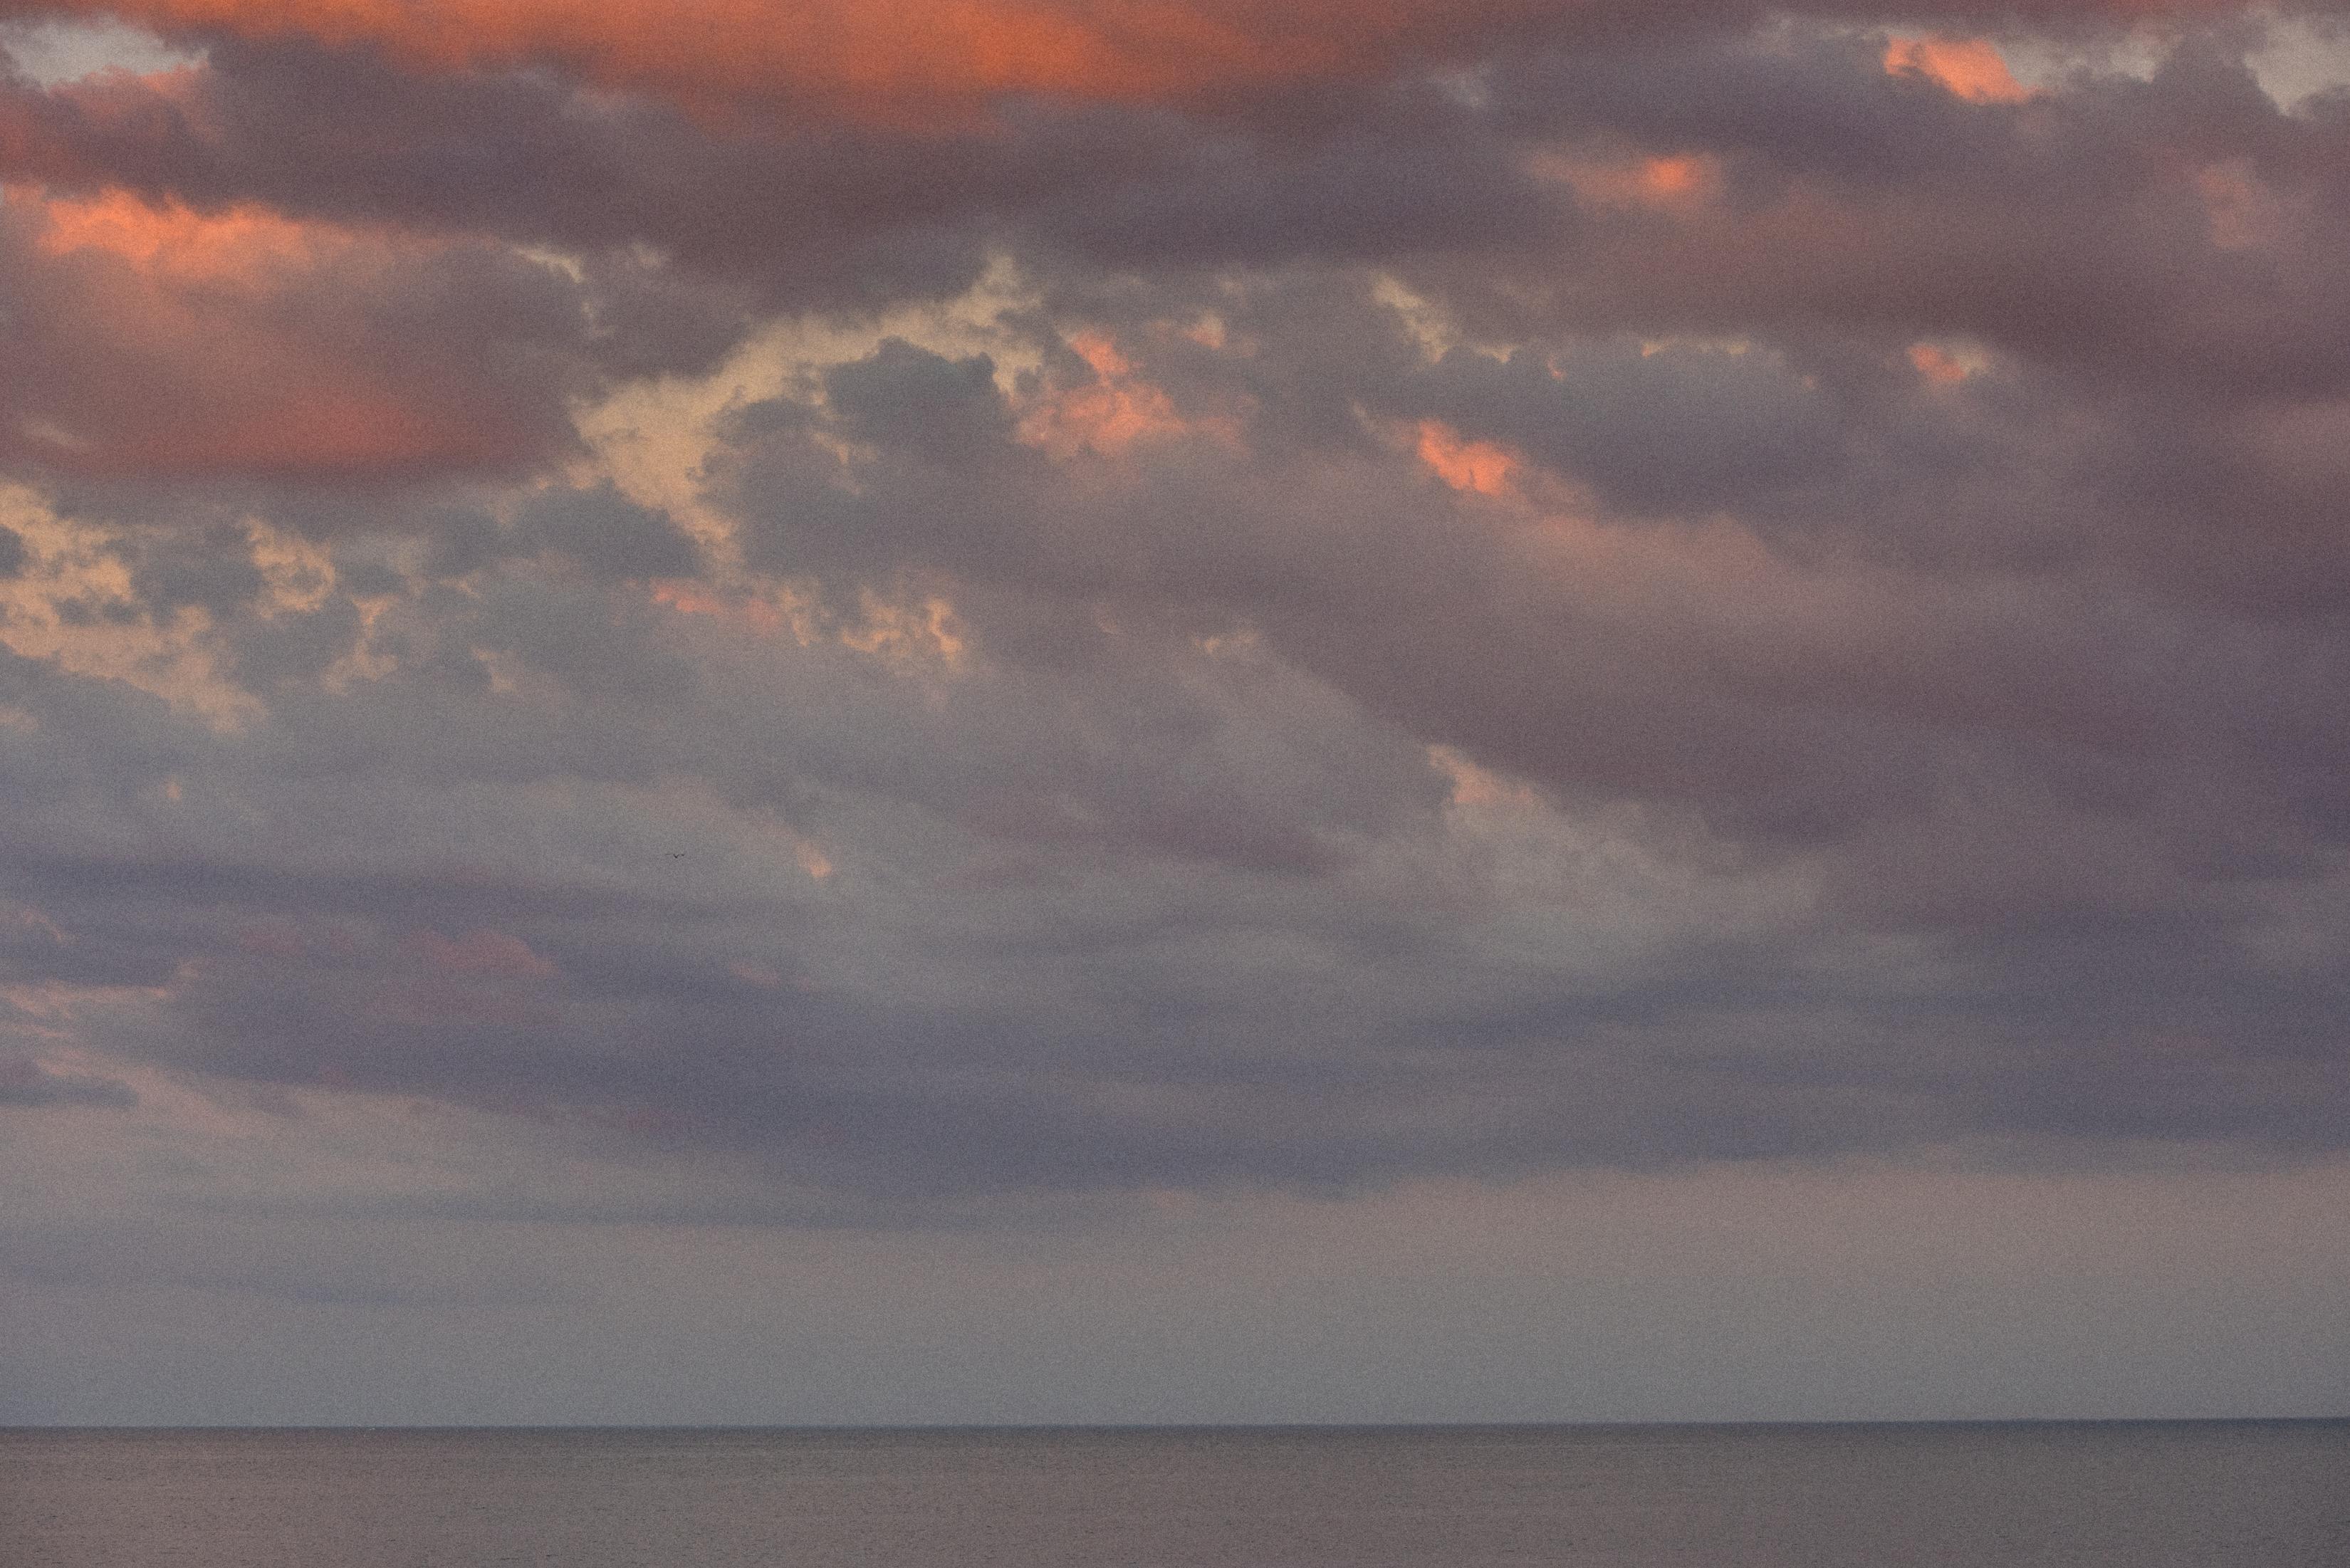 Humber Bay, Toronto, Ontario, Canada